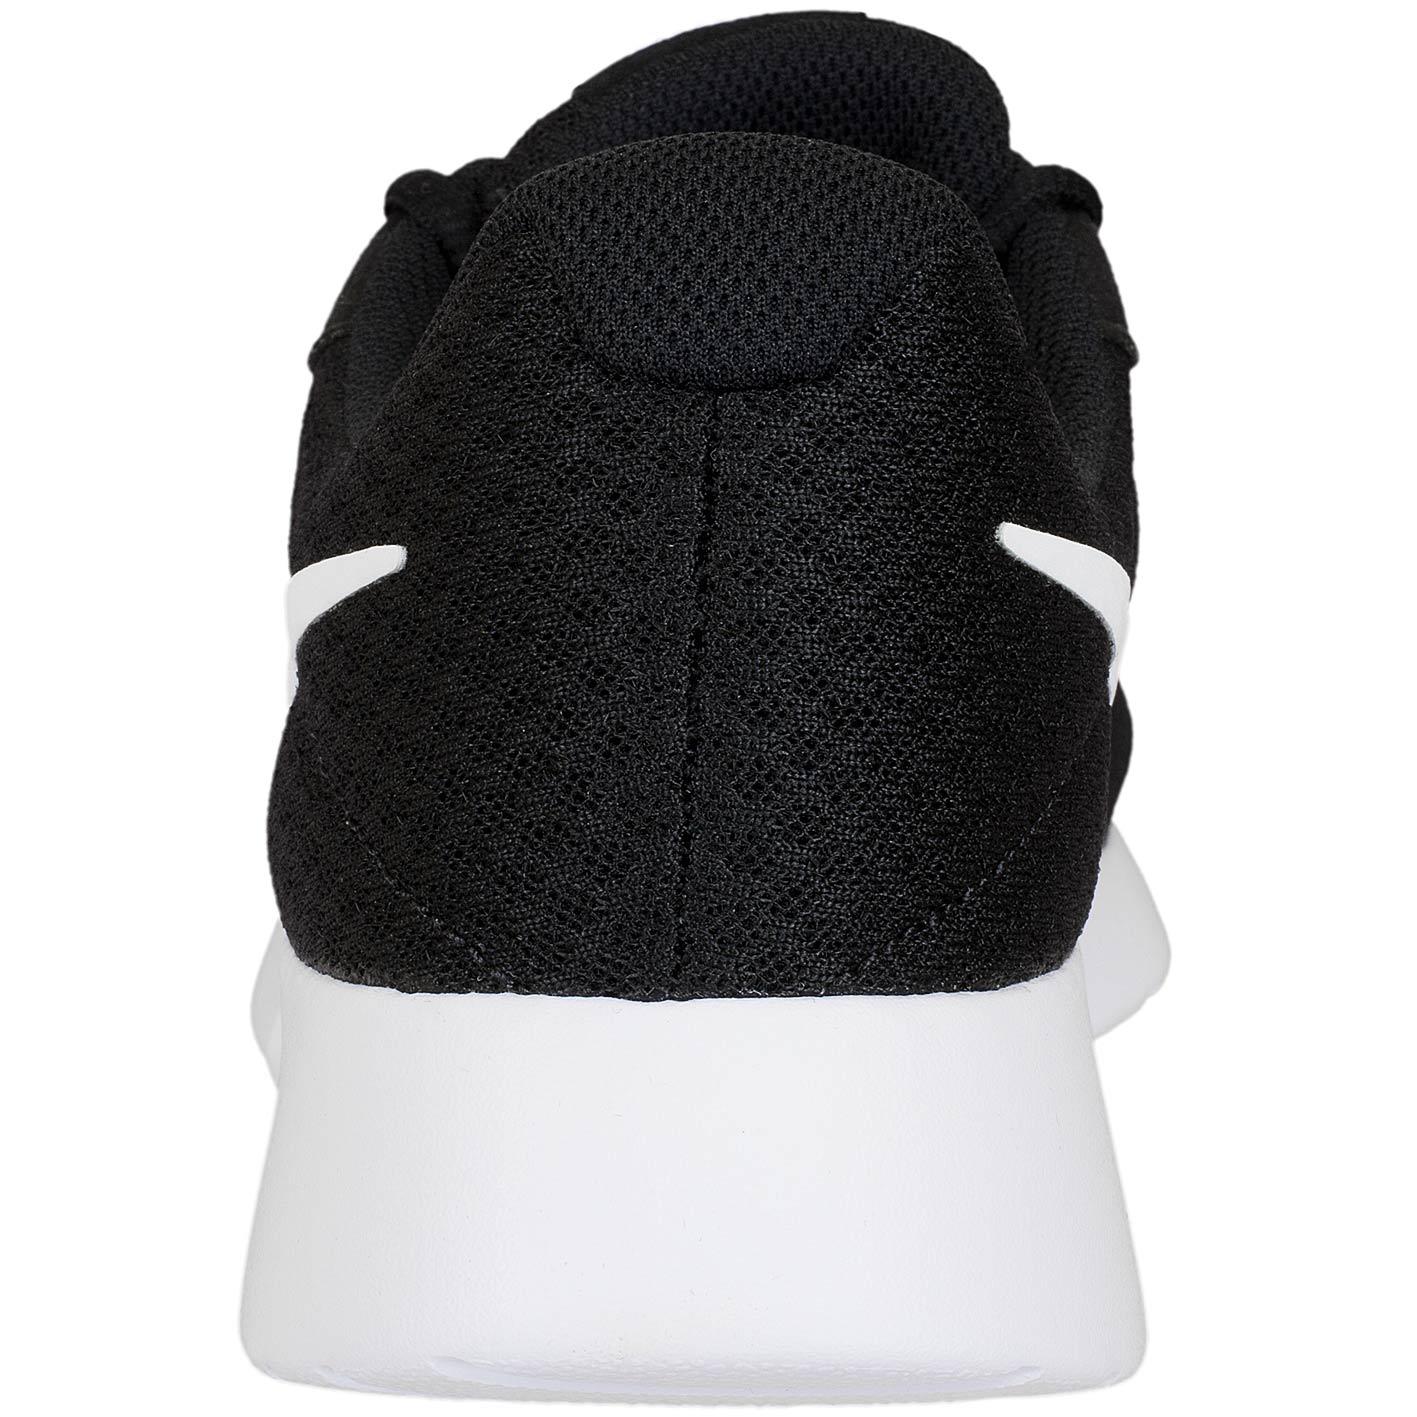 Nike Tanjun Sneaker schwarzweiß   Markenschuhe